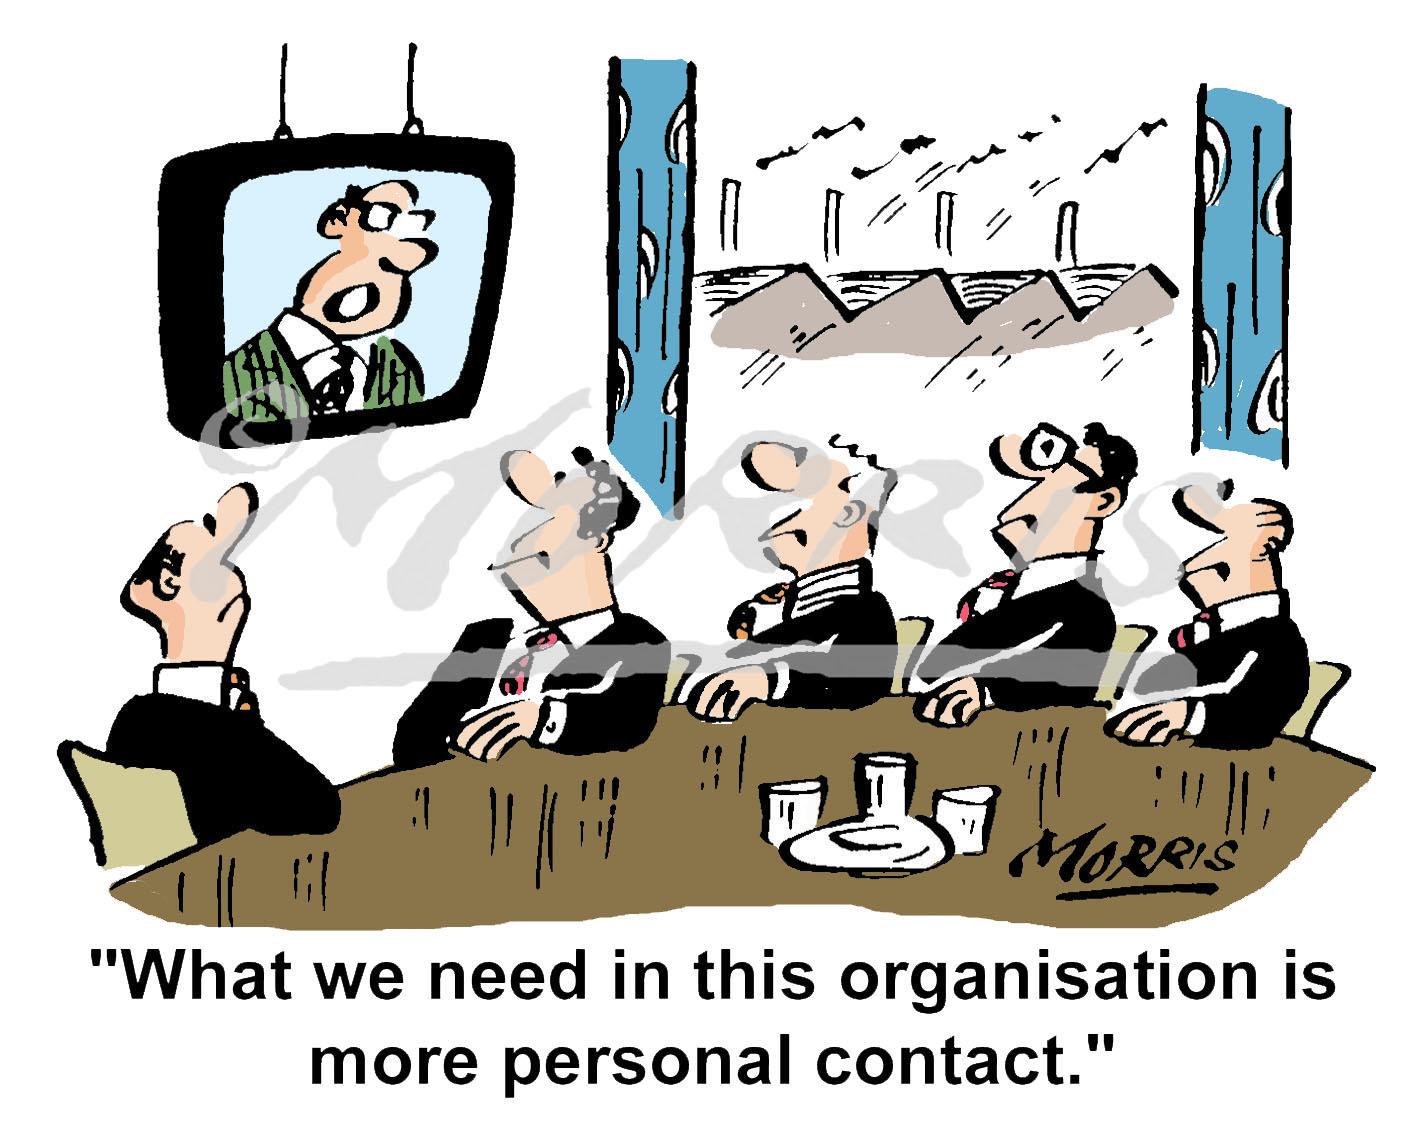 office communication cartoon, bad communication cartoon, business cartoon, meeting cartoon, boardroom meeting cartoon, management cartoon, staff meeting cartoon